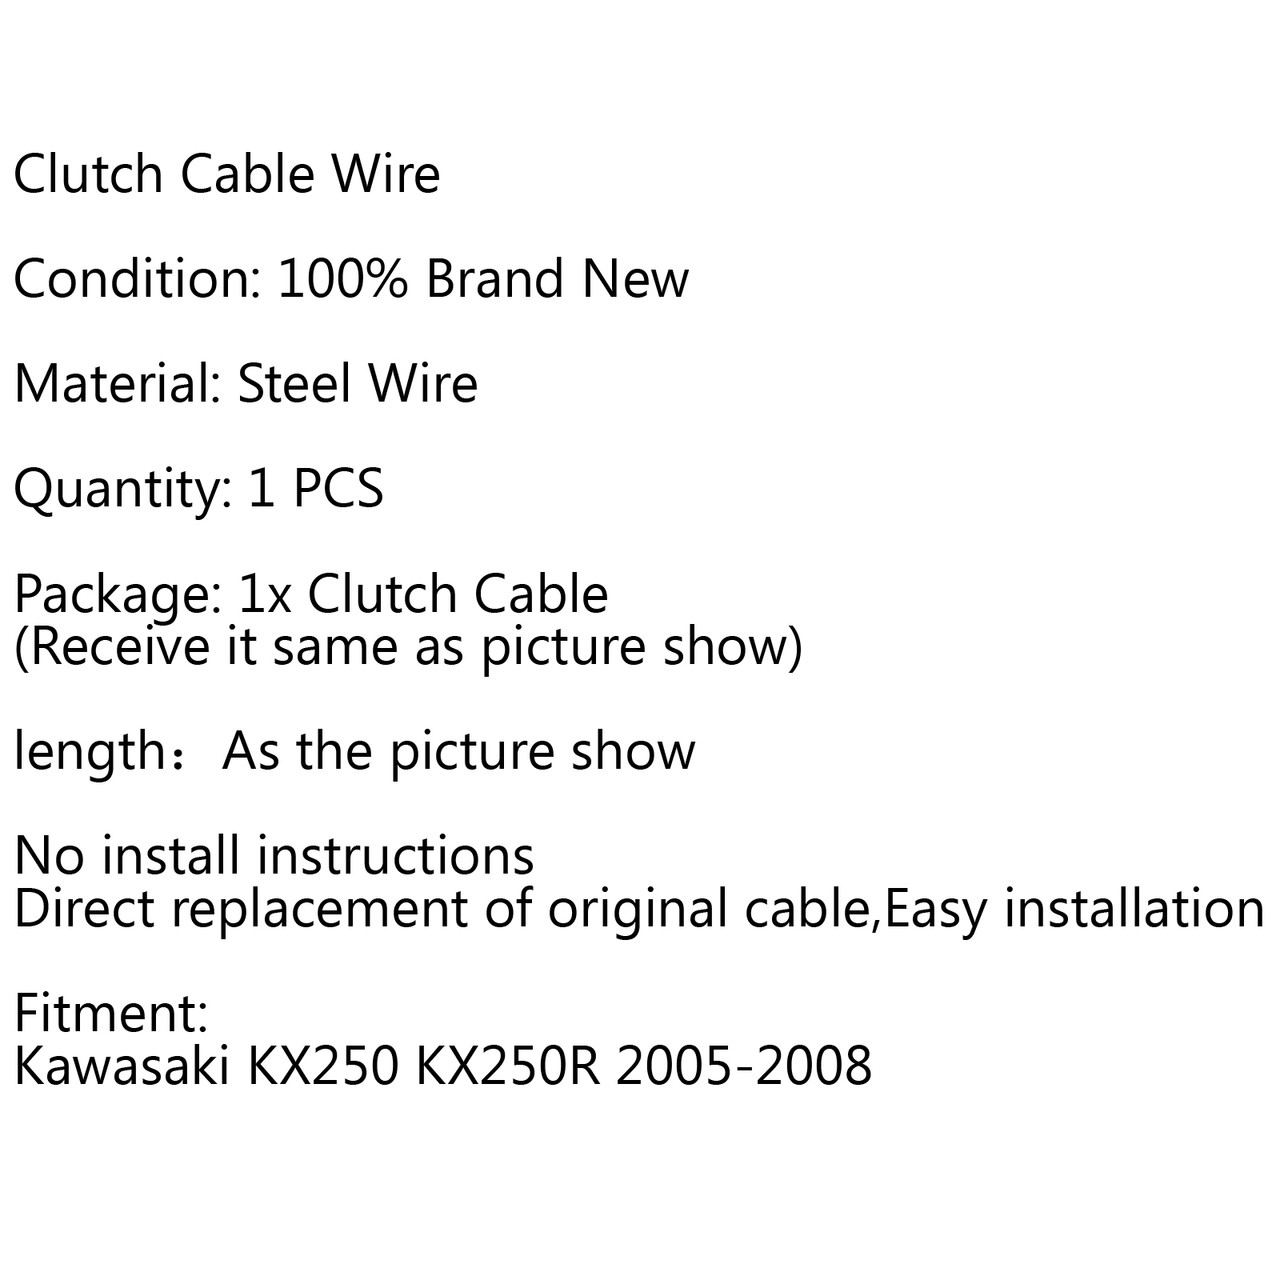 Clutch Cable Replacement Kawasaki KX250 KX250R (2005-2008)